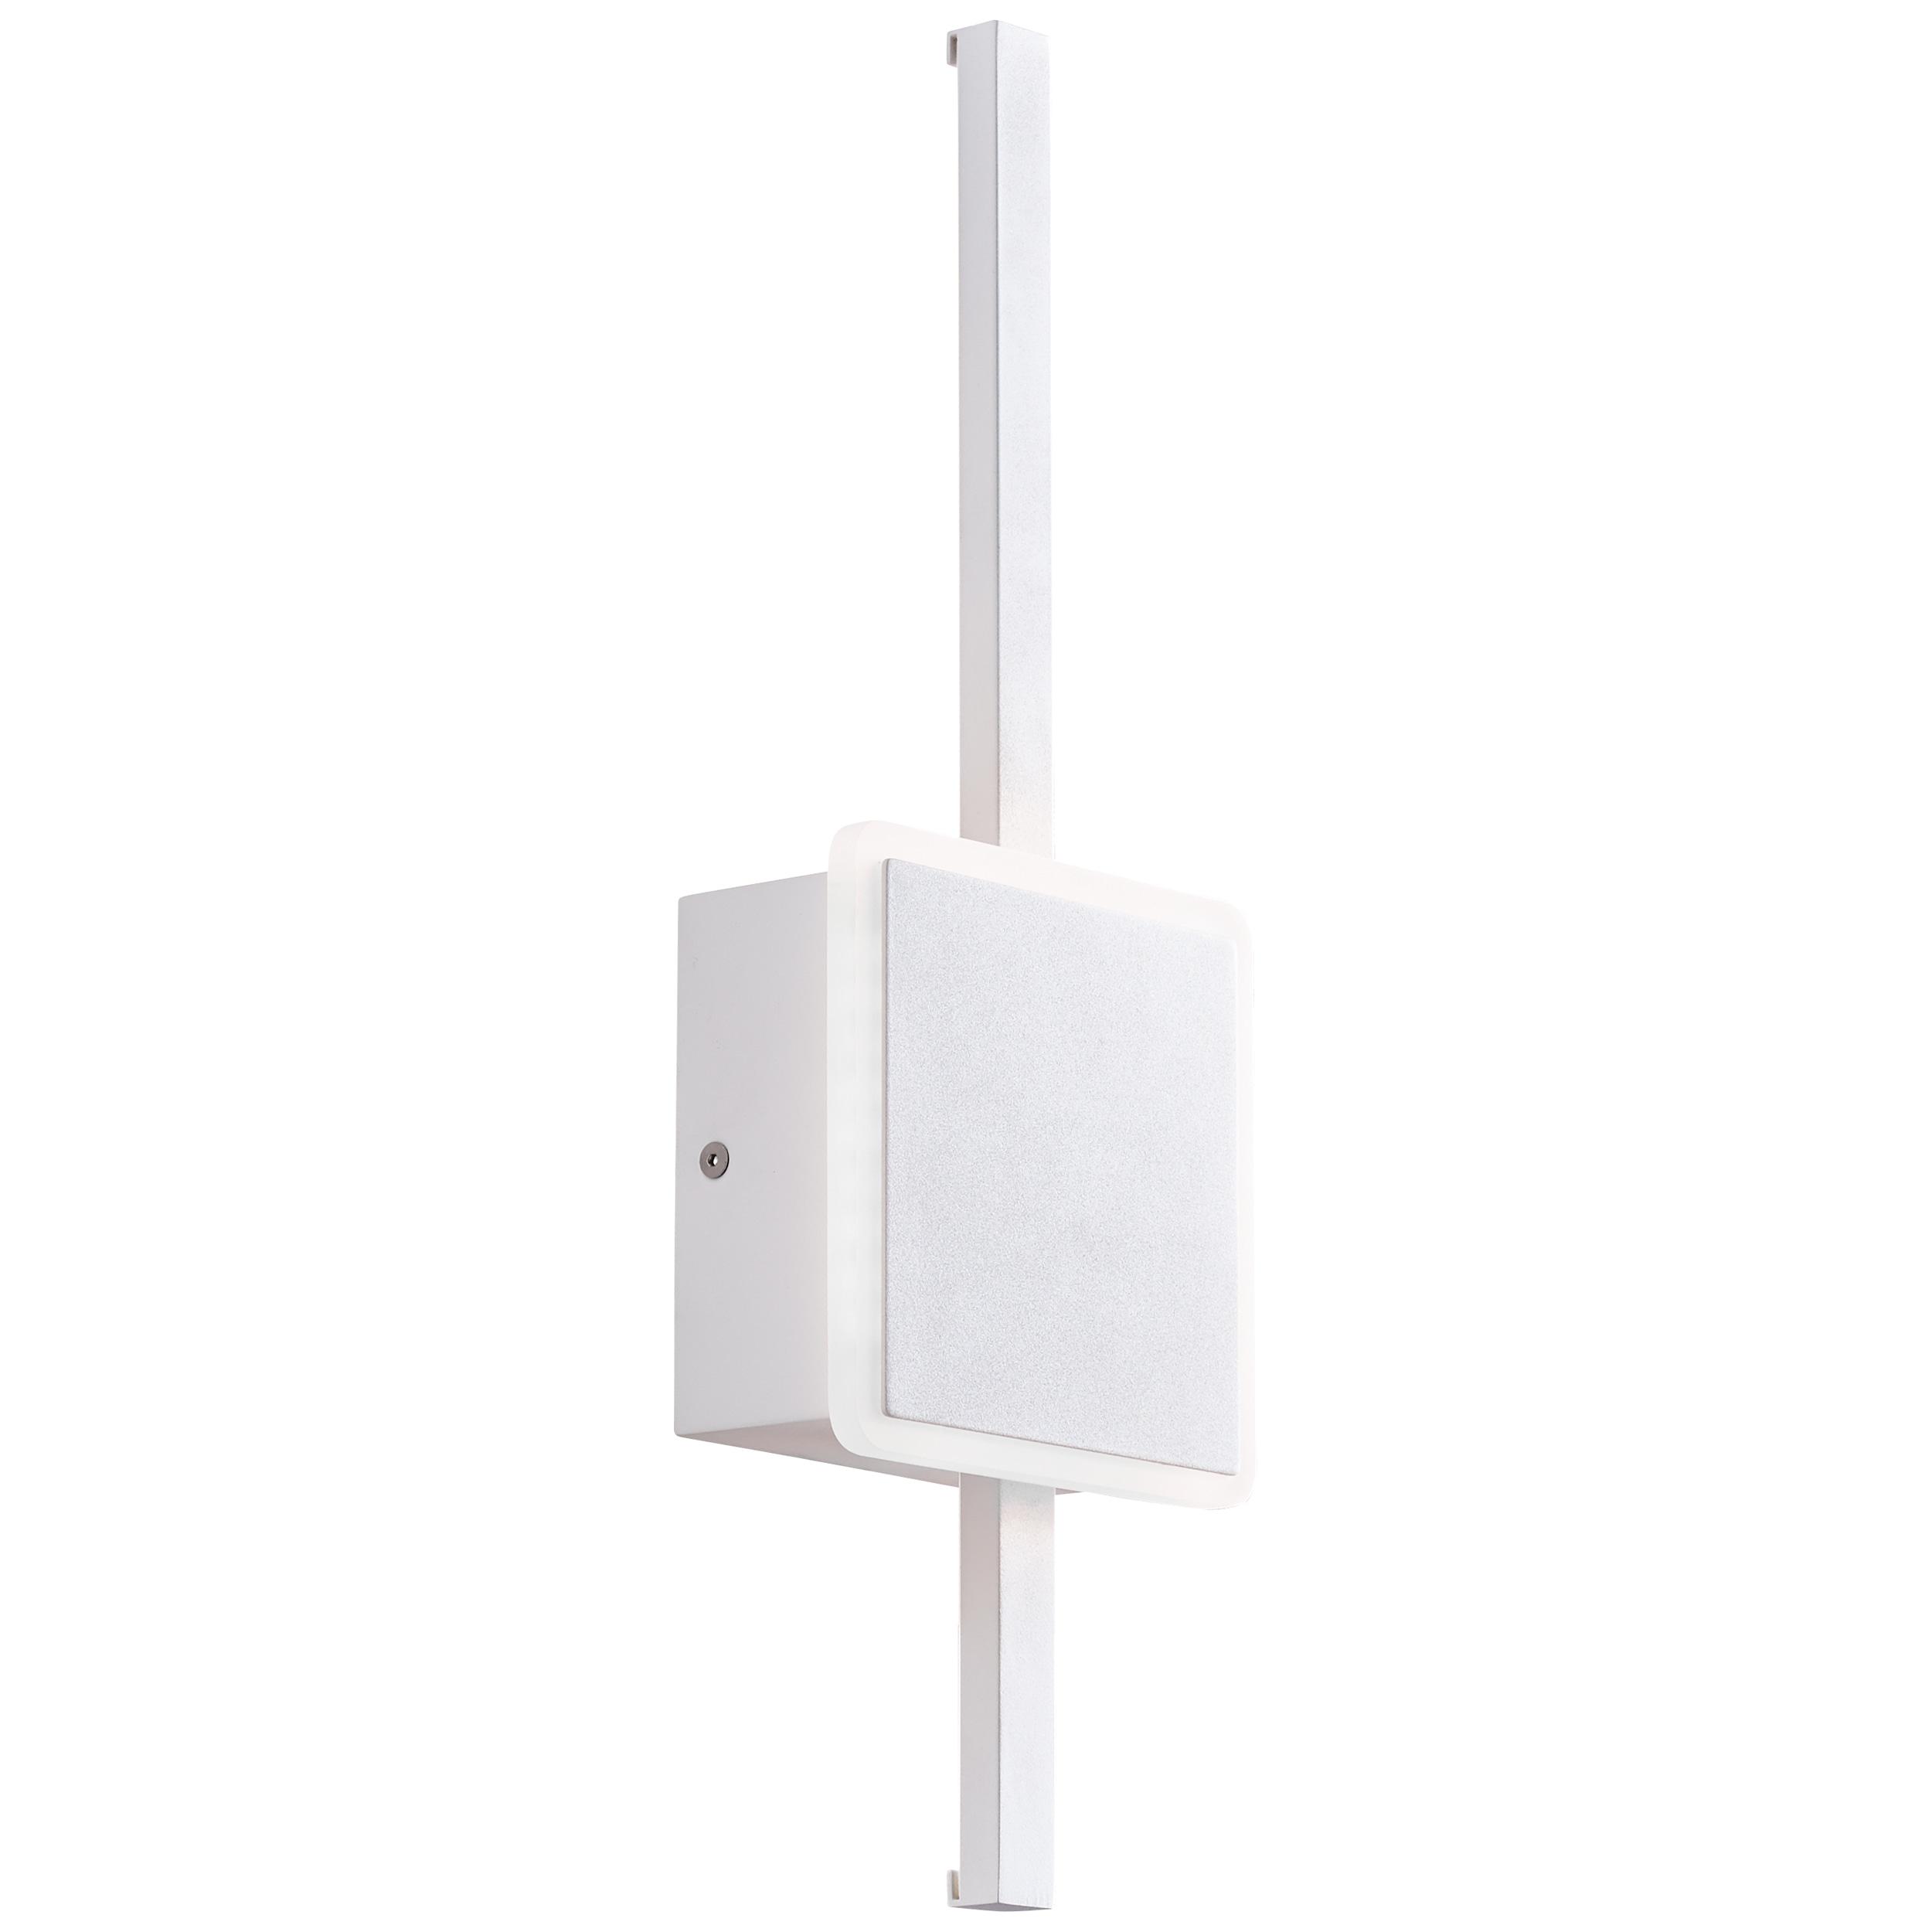 AEG Inessa LED Wandleuchte 42cm sand/weiß